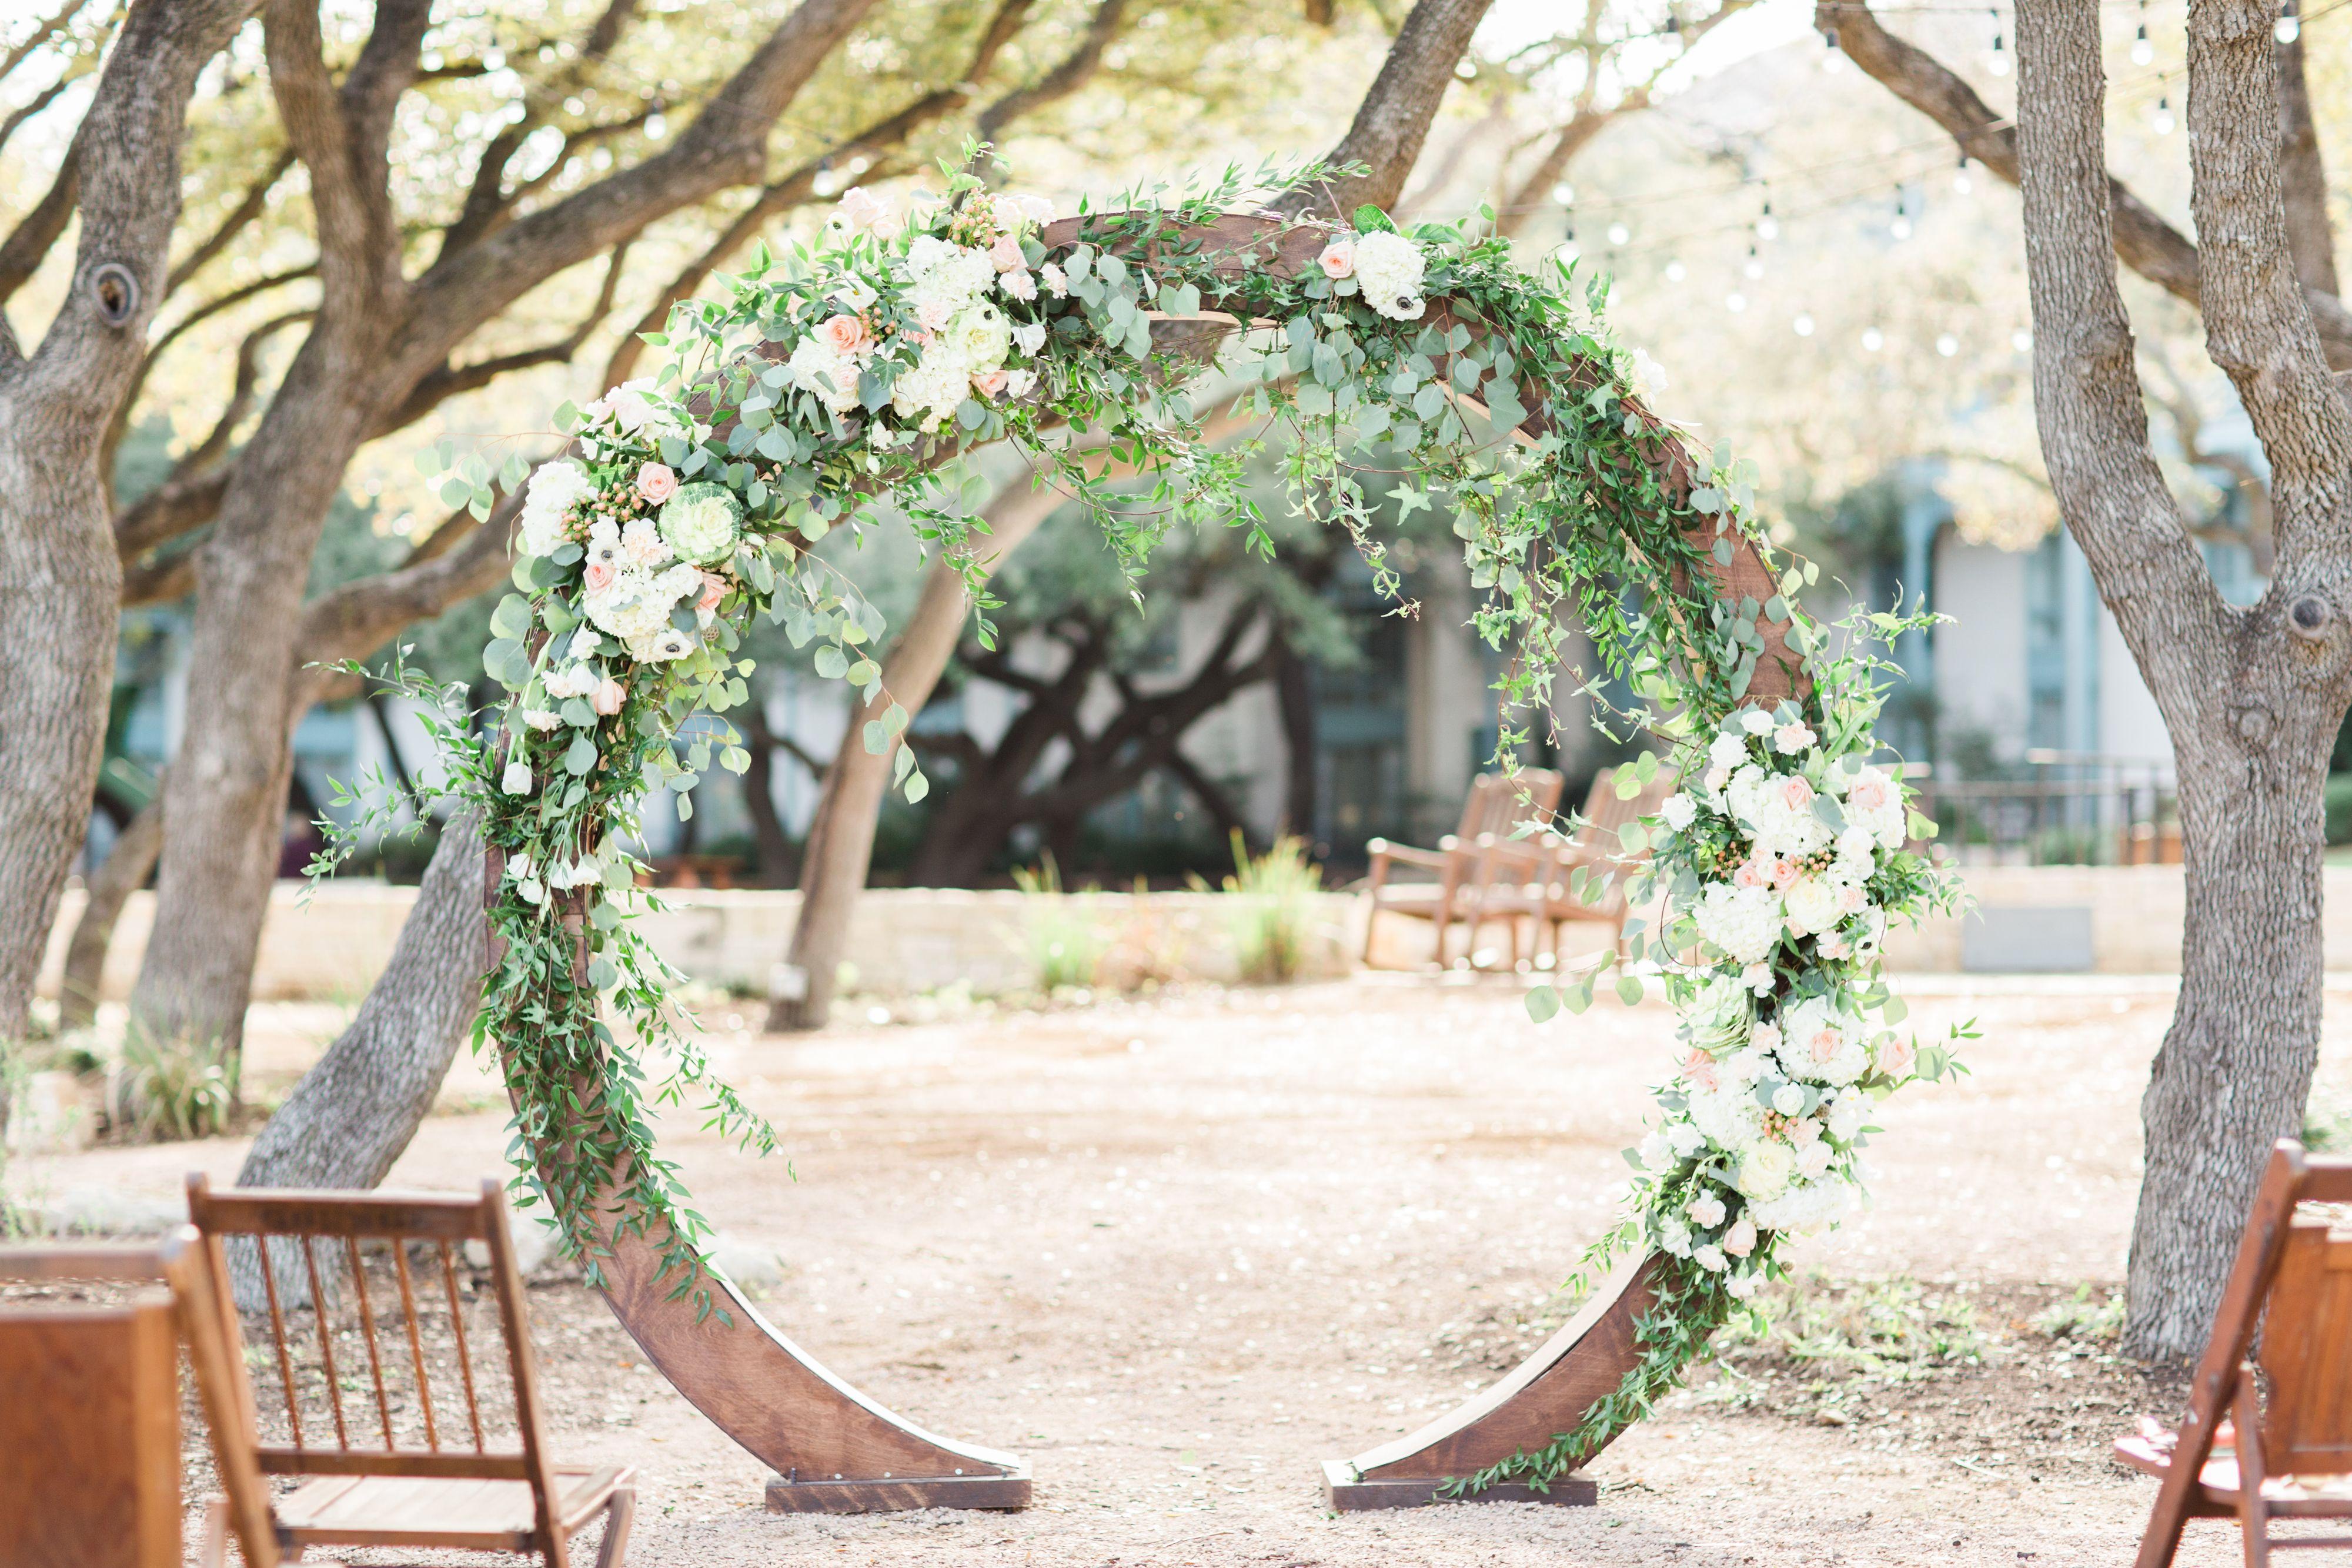 This Rustic Yet Elegant Outdoor Wedding Venue Is